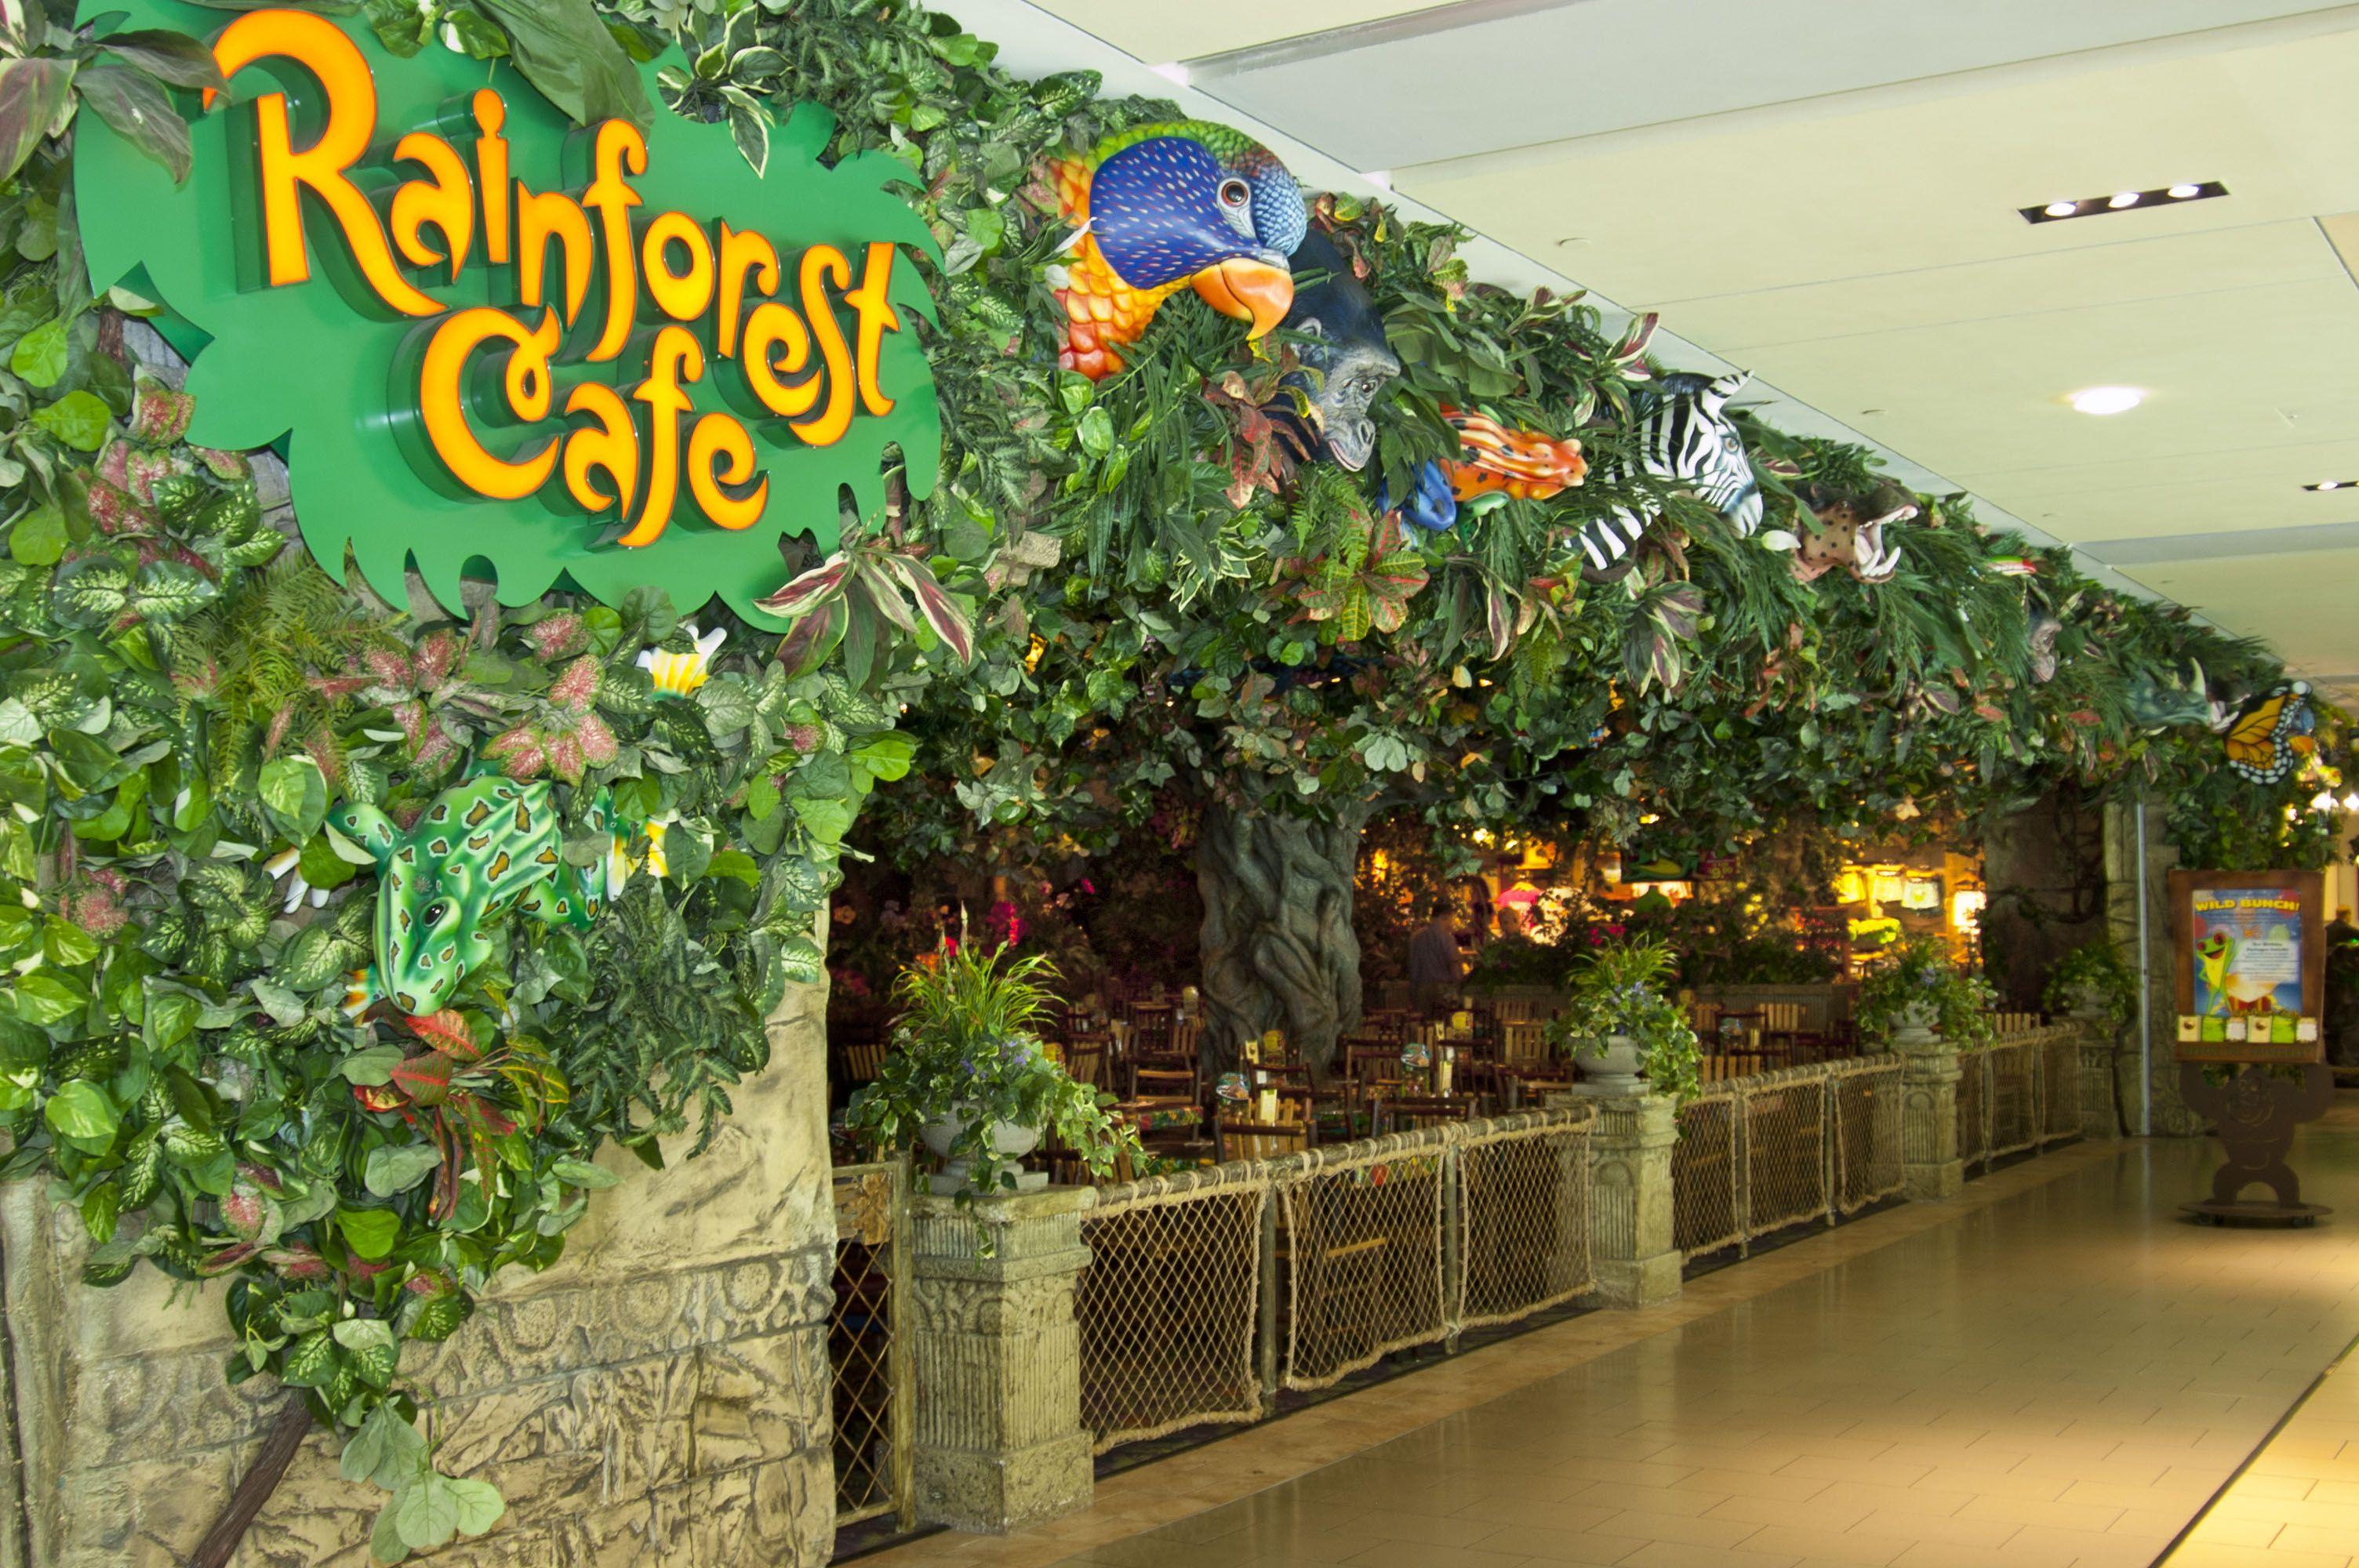 Houston Galleria | The Rainforest Cafe | Pinterest | Rainforest cafe